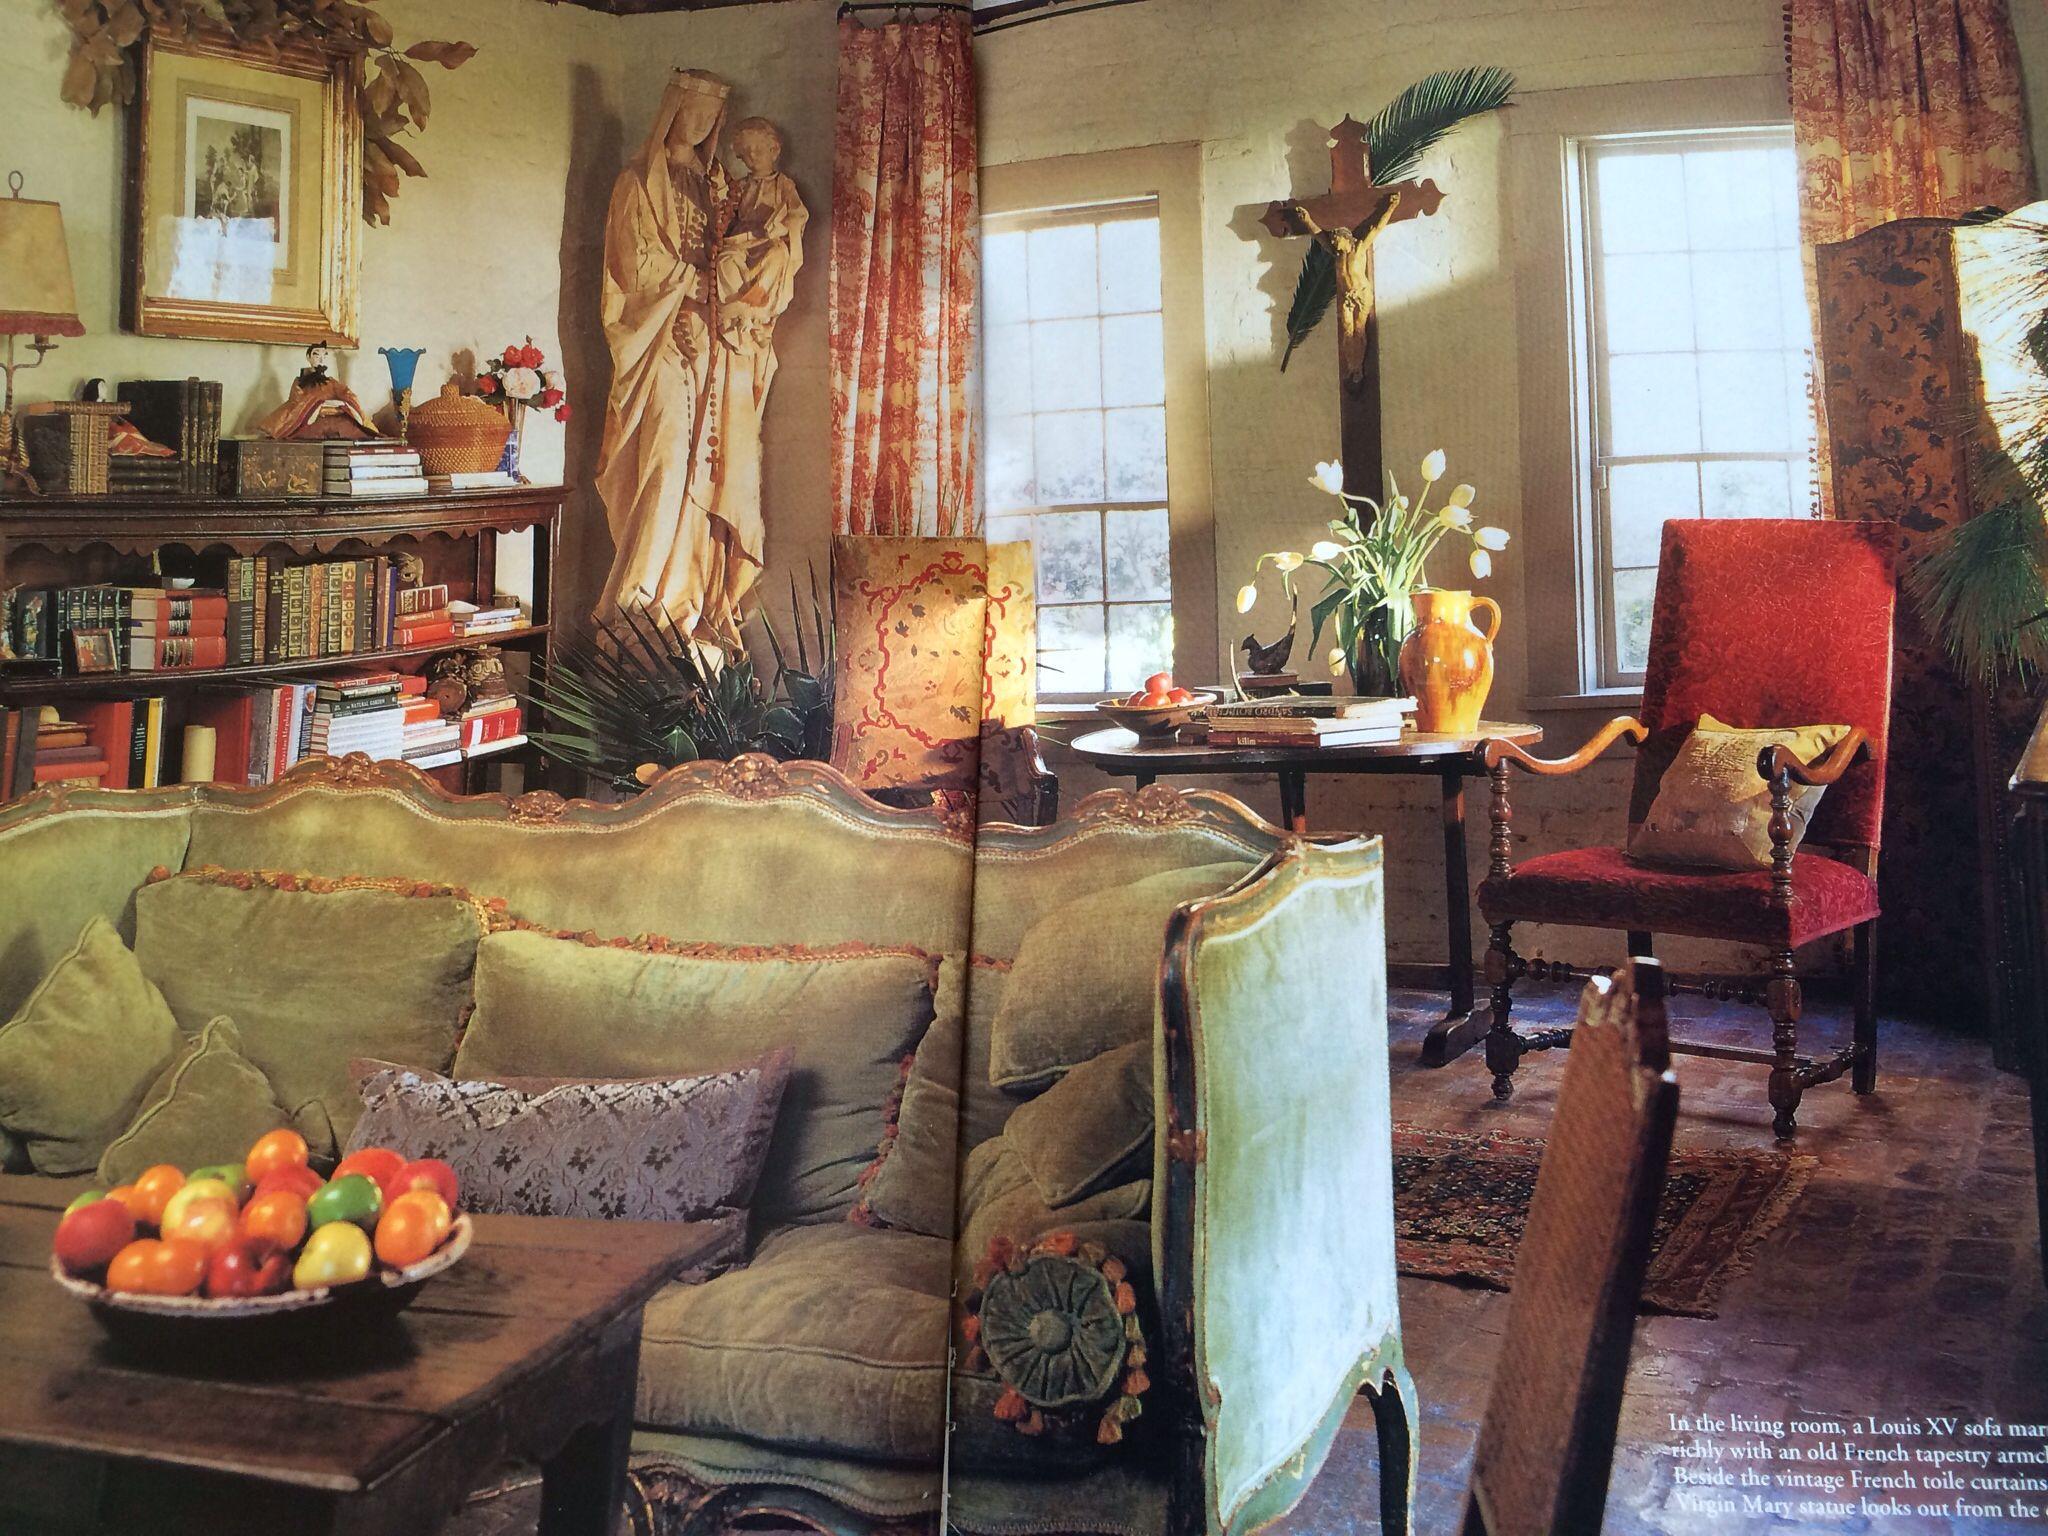 Creole Decor Ideas For The House Pinterest Home Decorators Catalog Best Ideas of Home Decor and Design [homedecoratorscatalog.us]